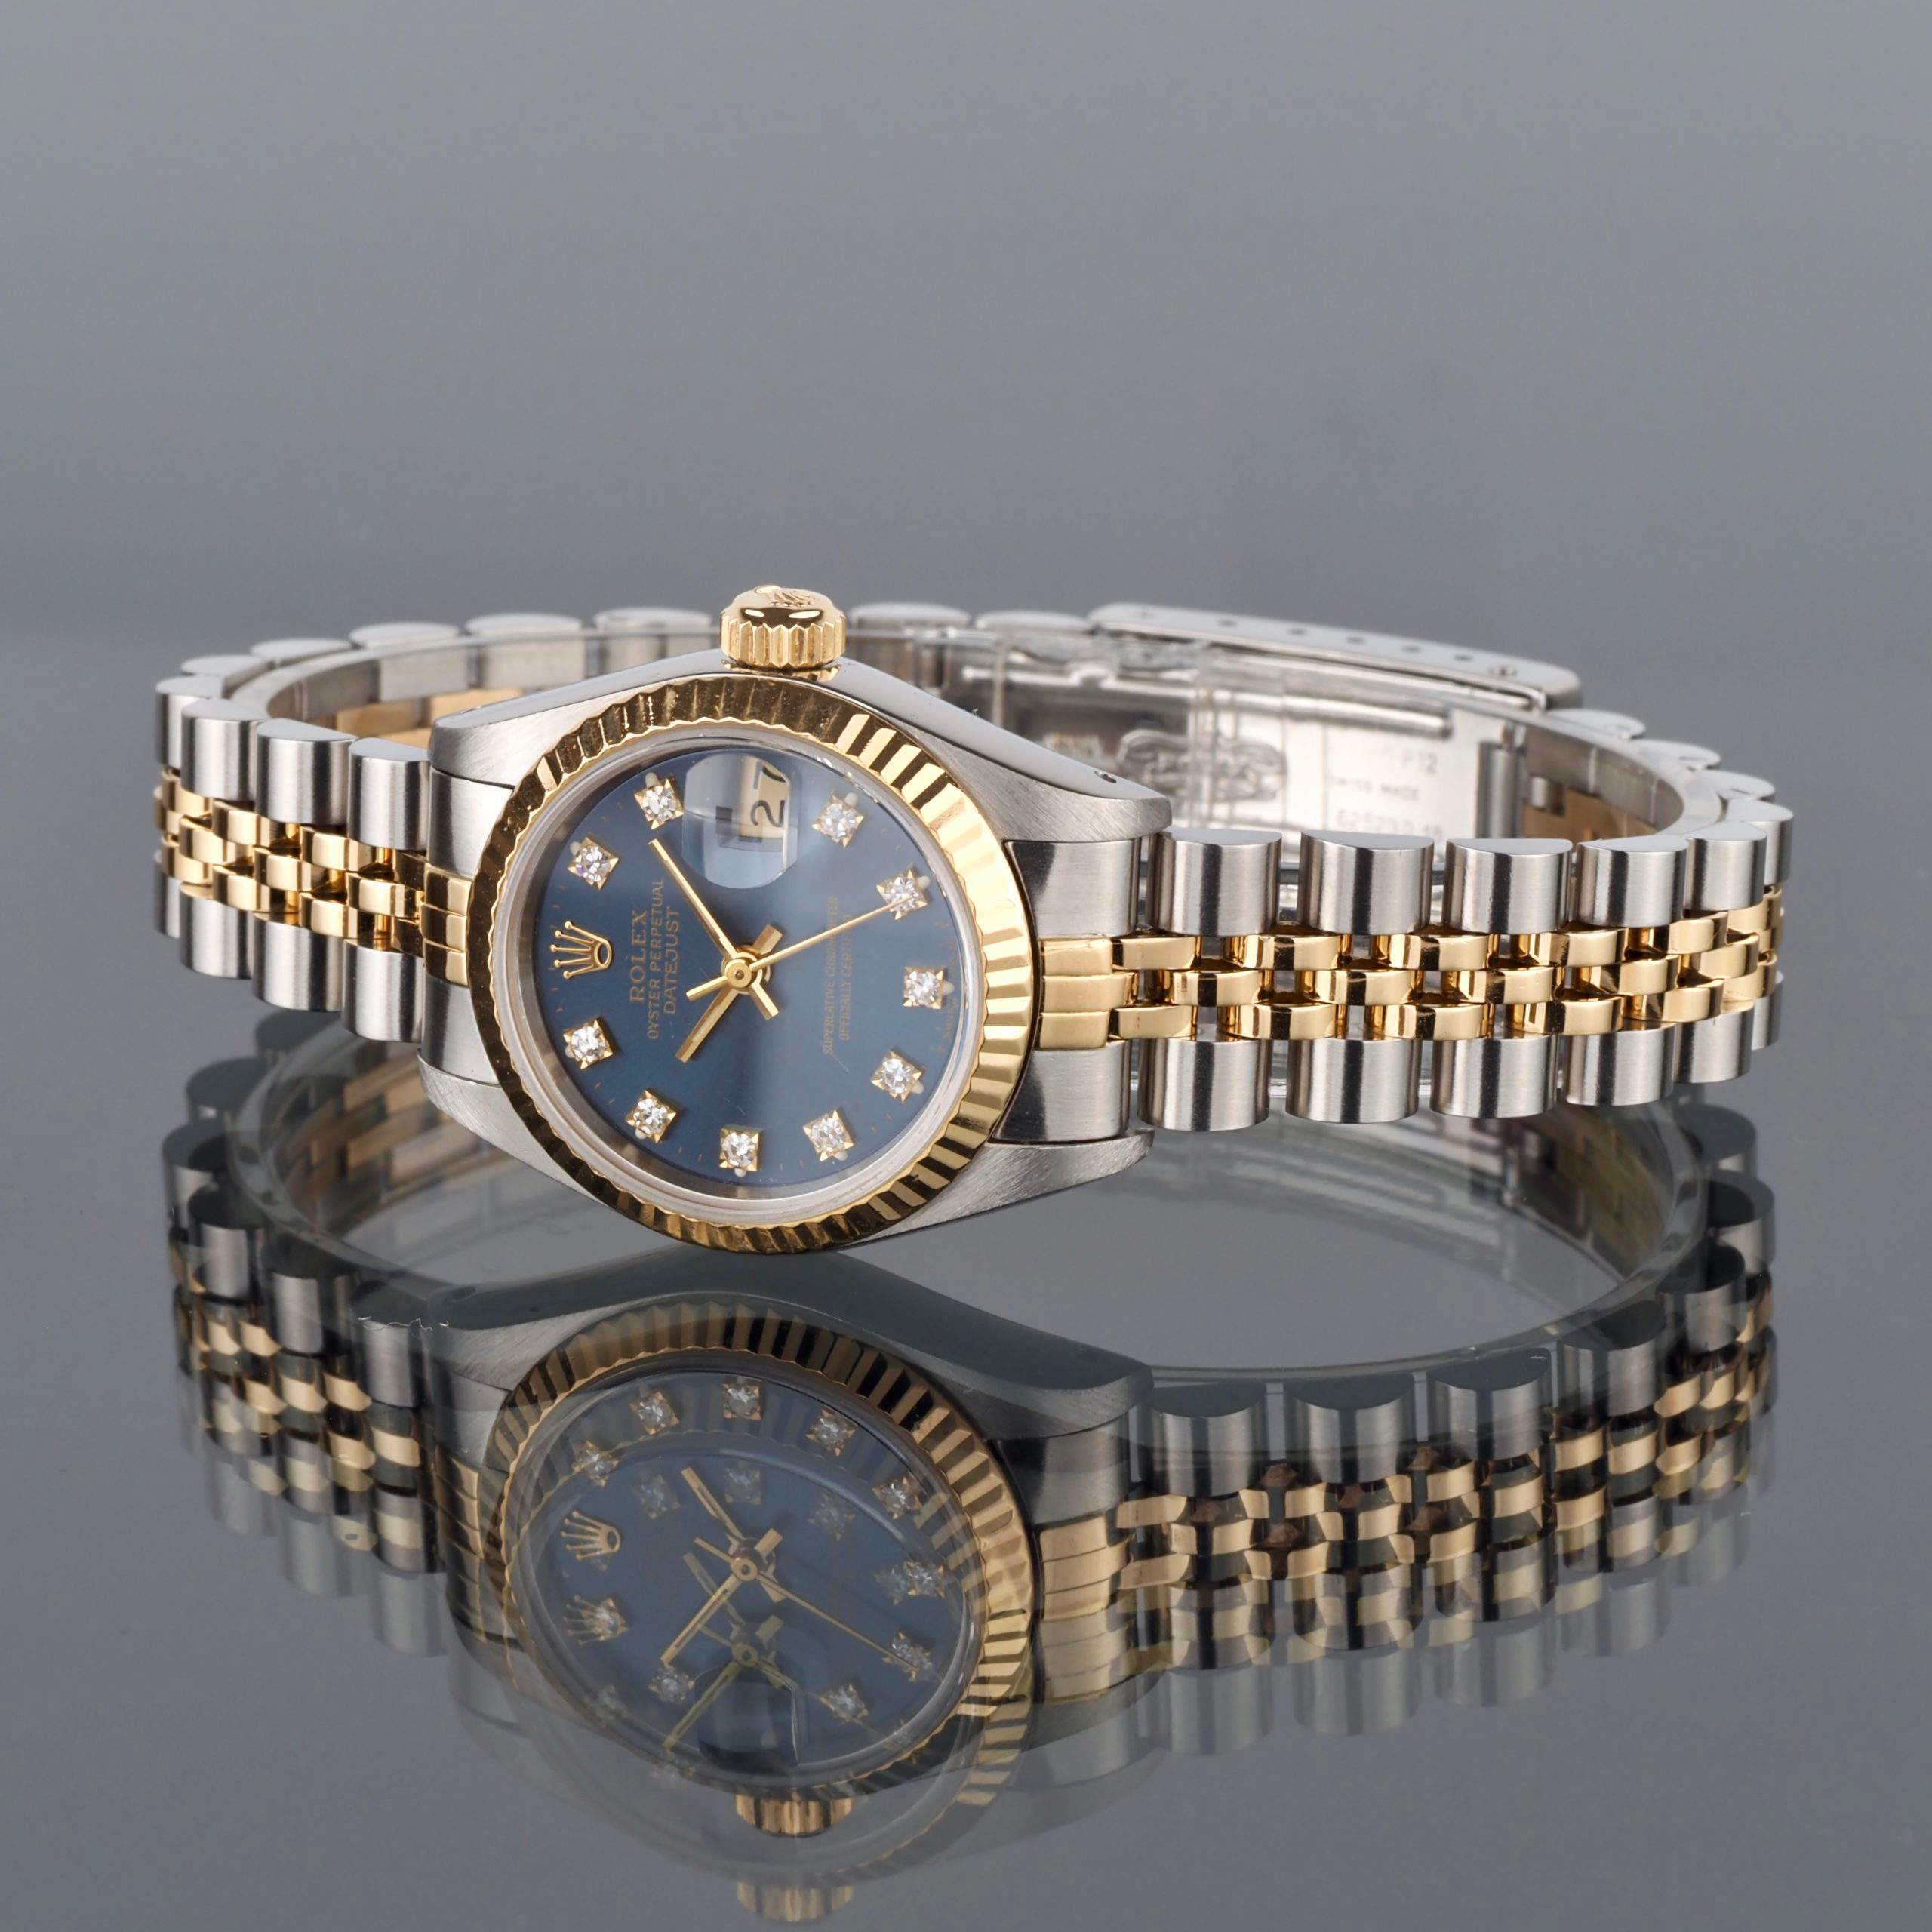 Rolex Lady-Datejust Ref. 69173